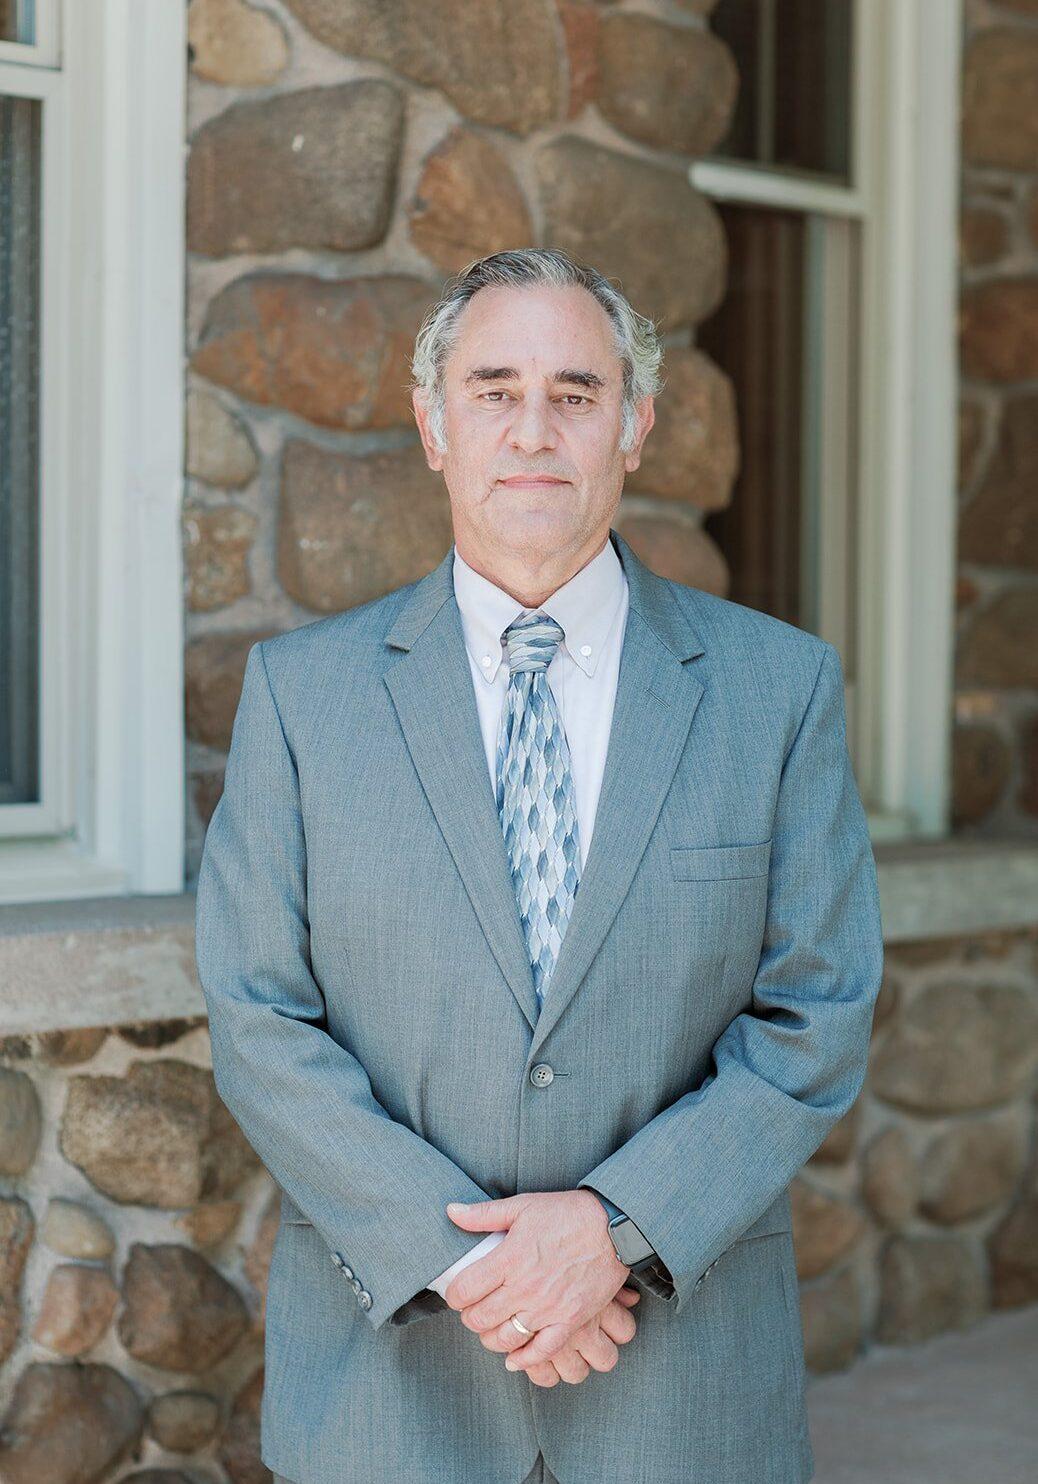 Attorney Jon D. Biller